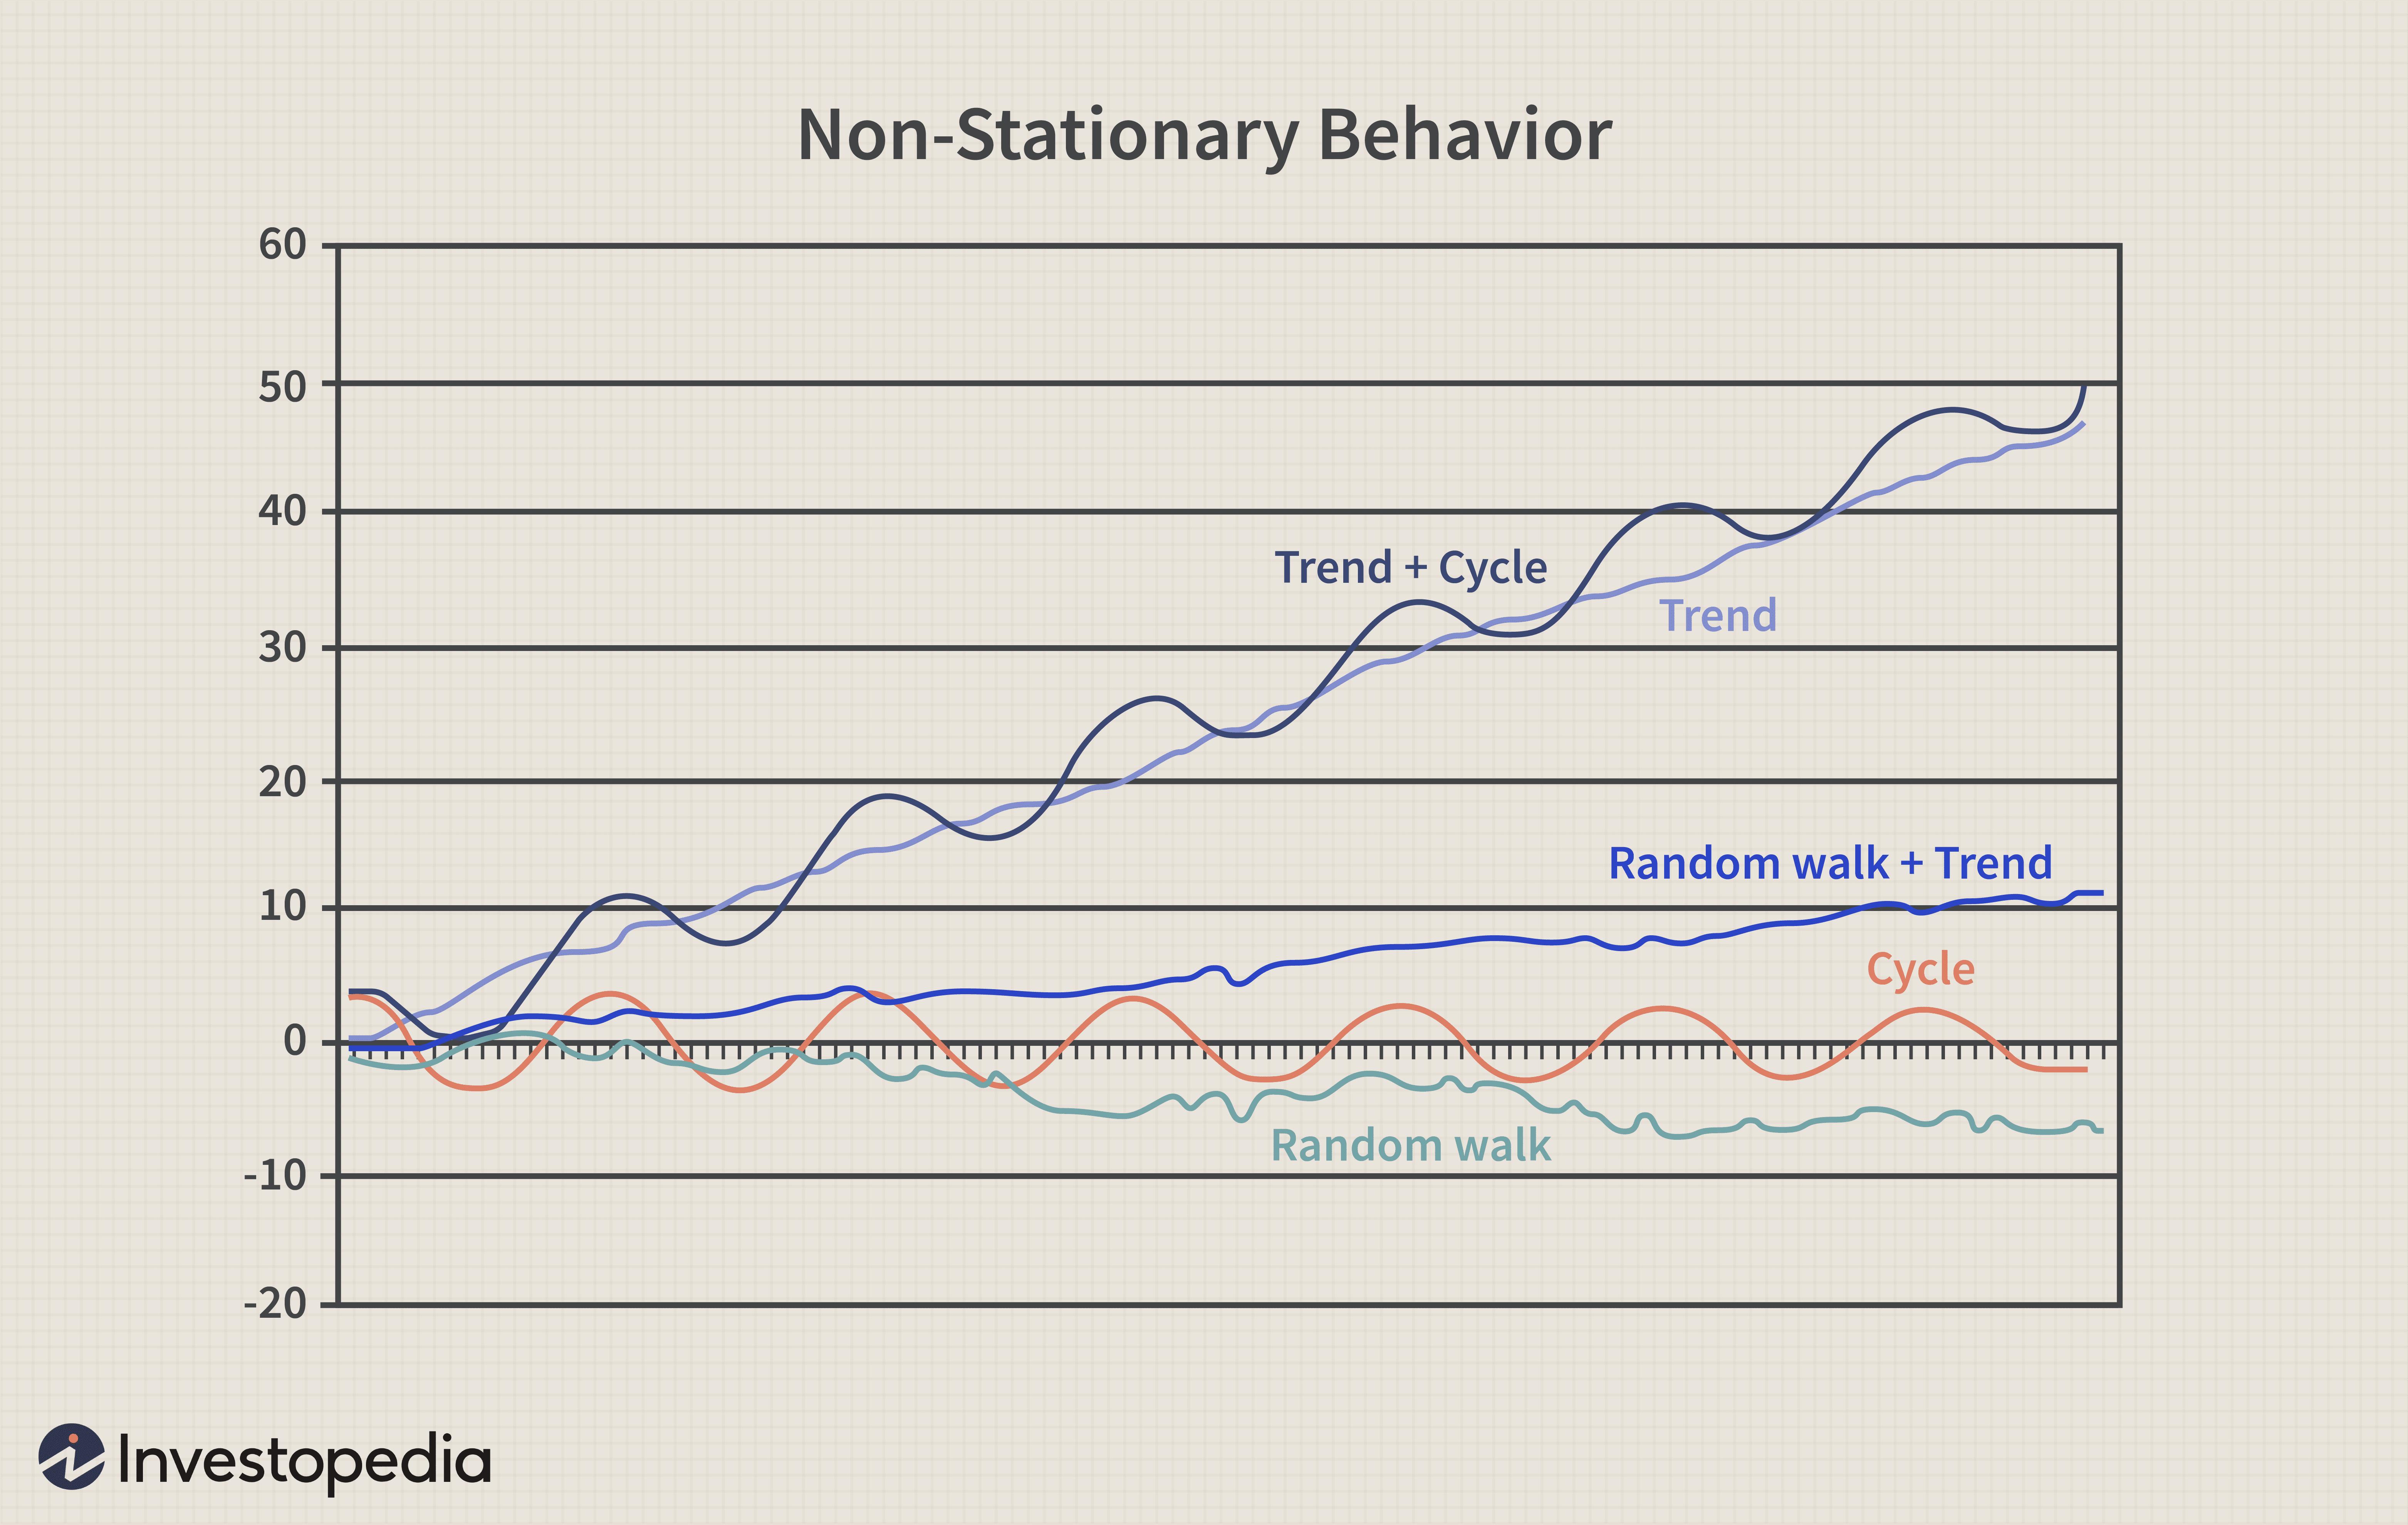 Non-Stationary Behavior